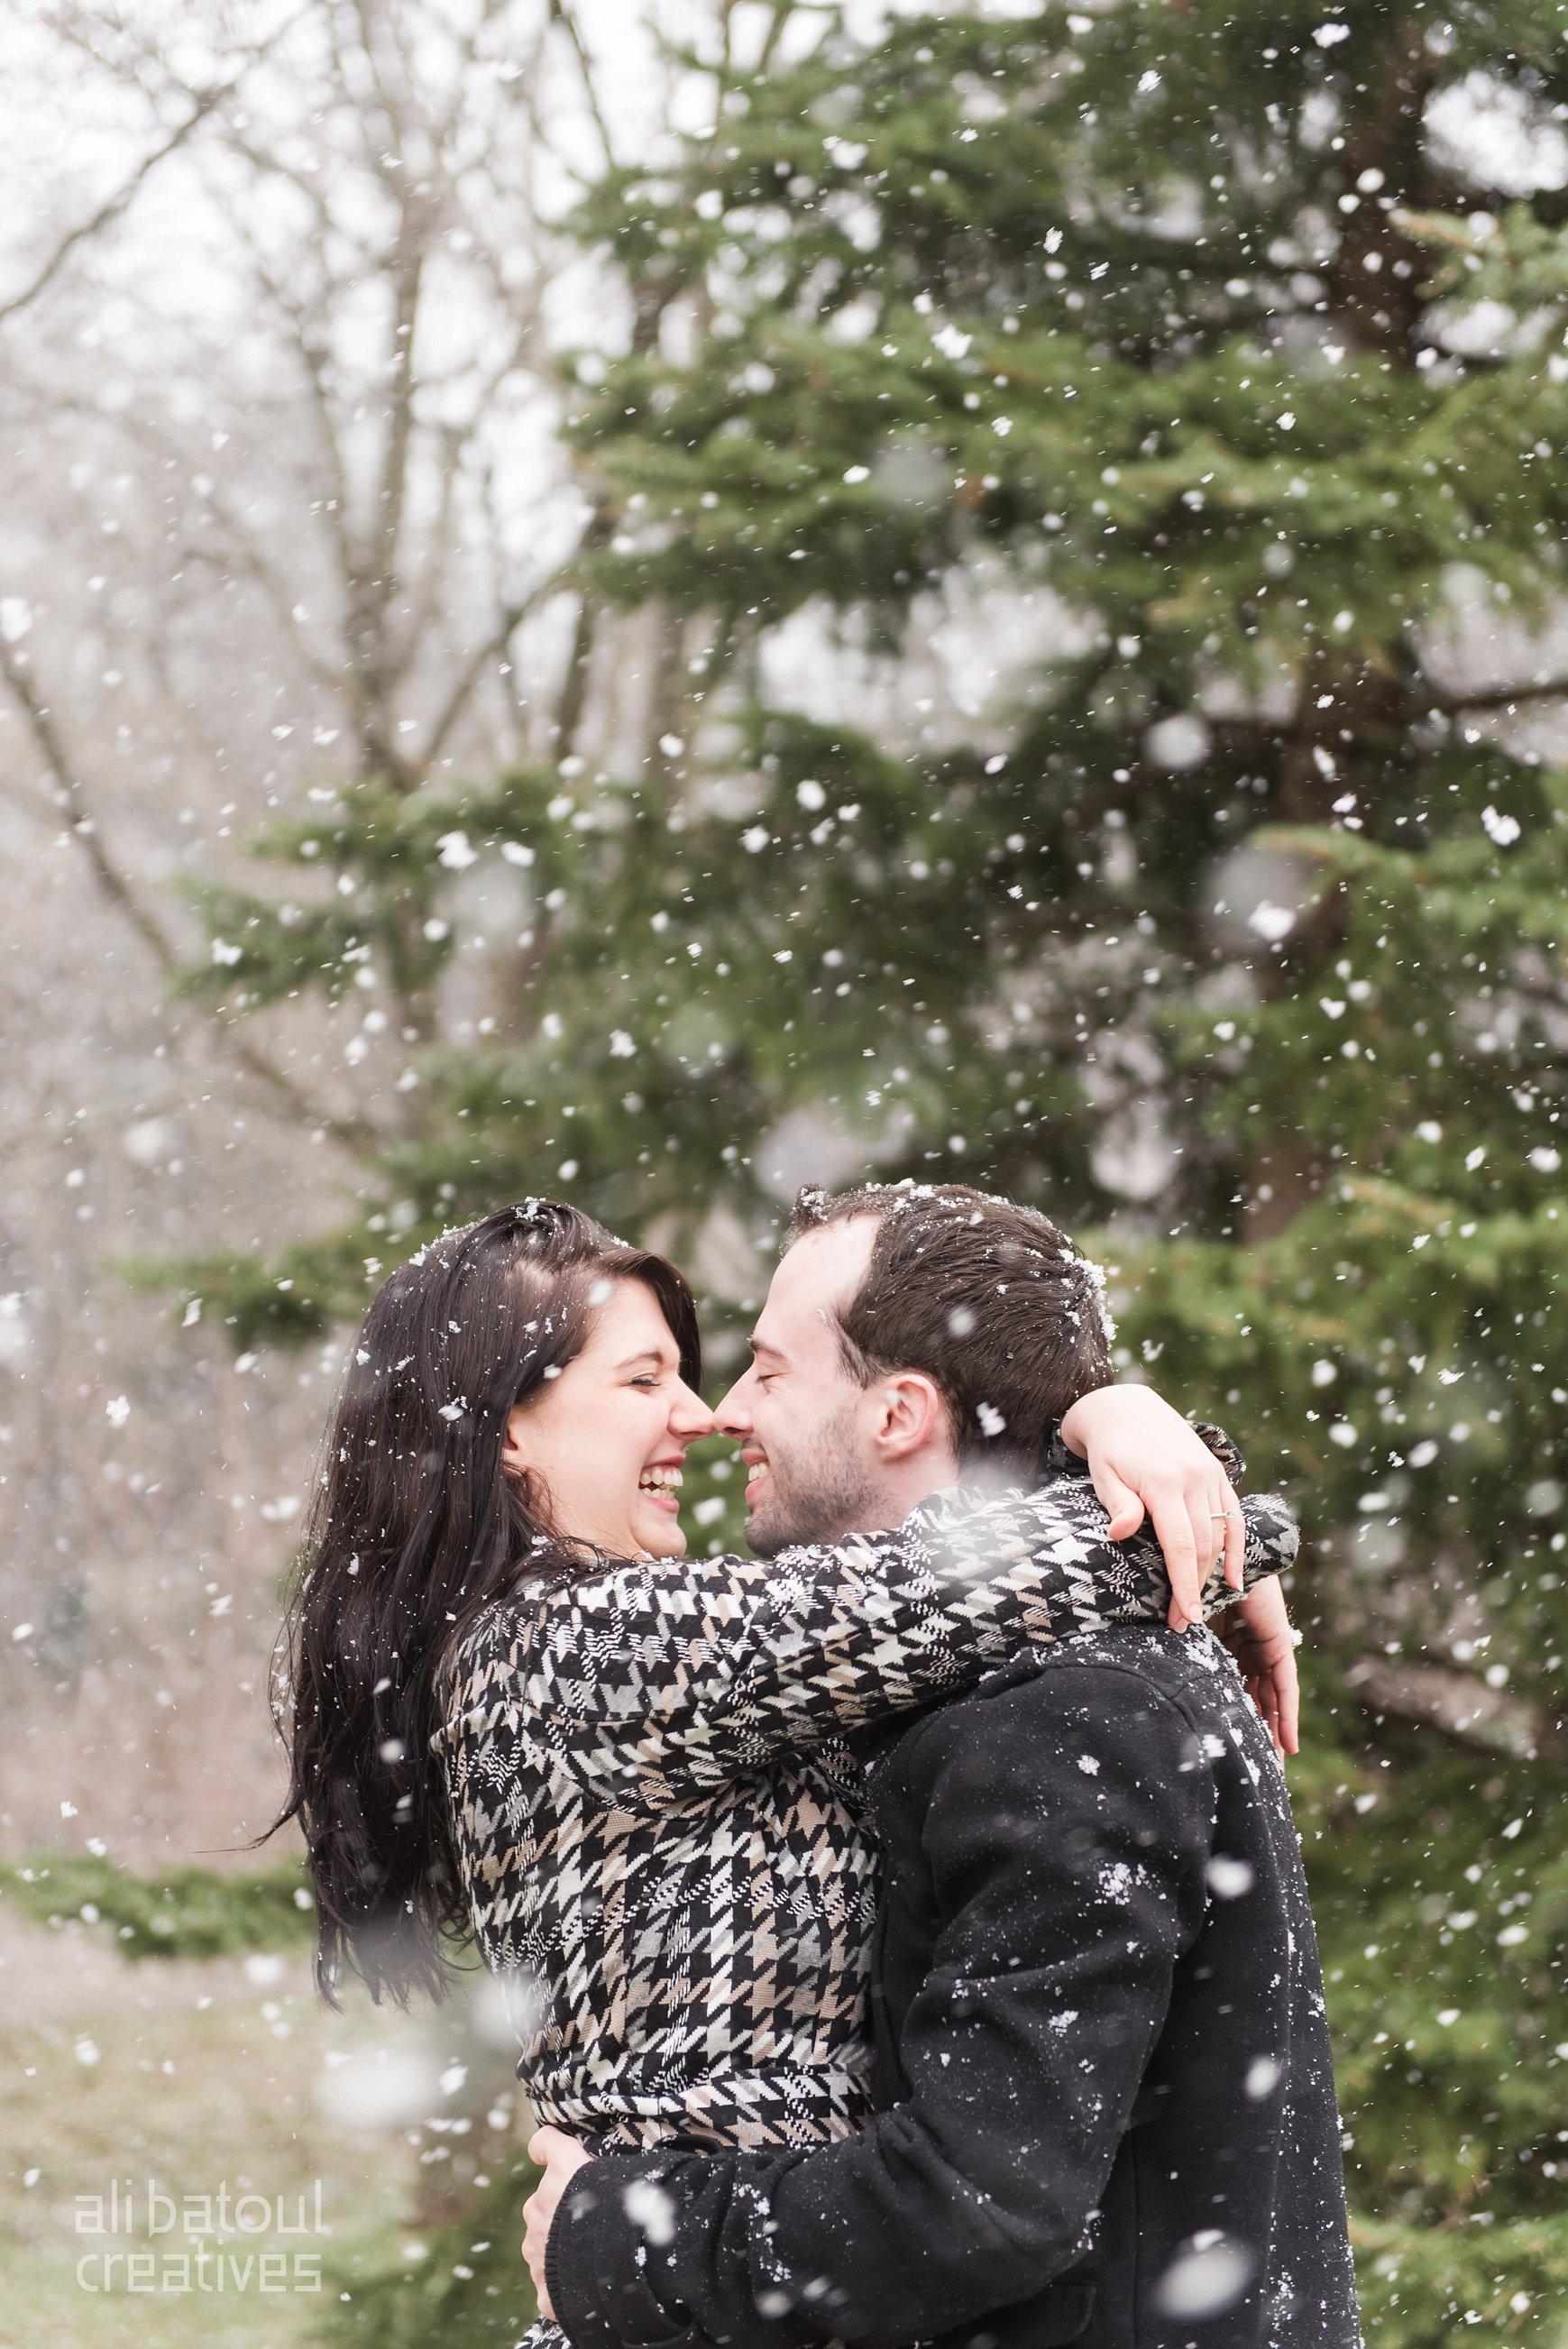 Ottawa Wedding Photography - Ali Batoul Creatives_0021.jpg